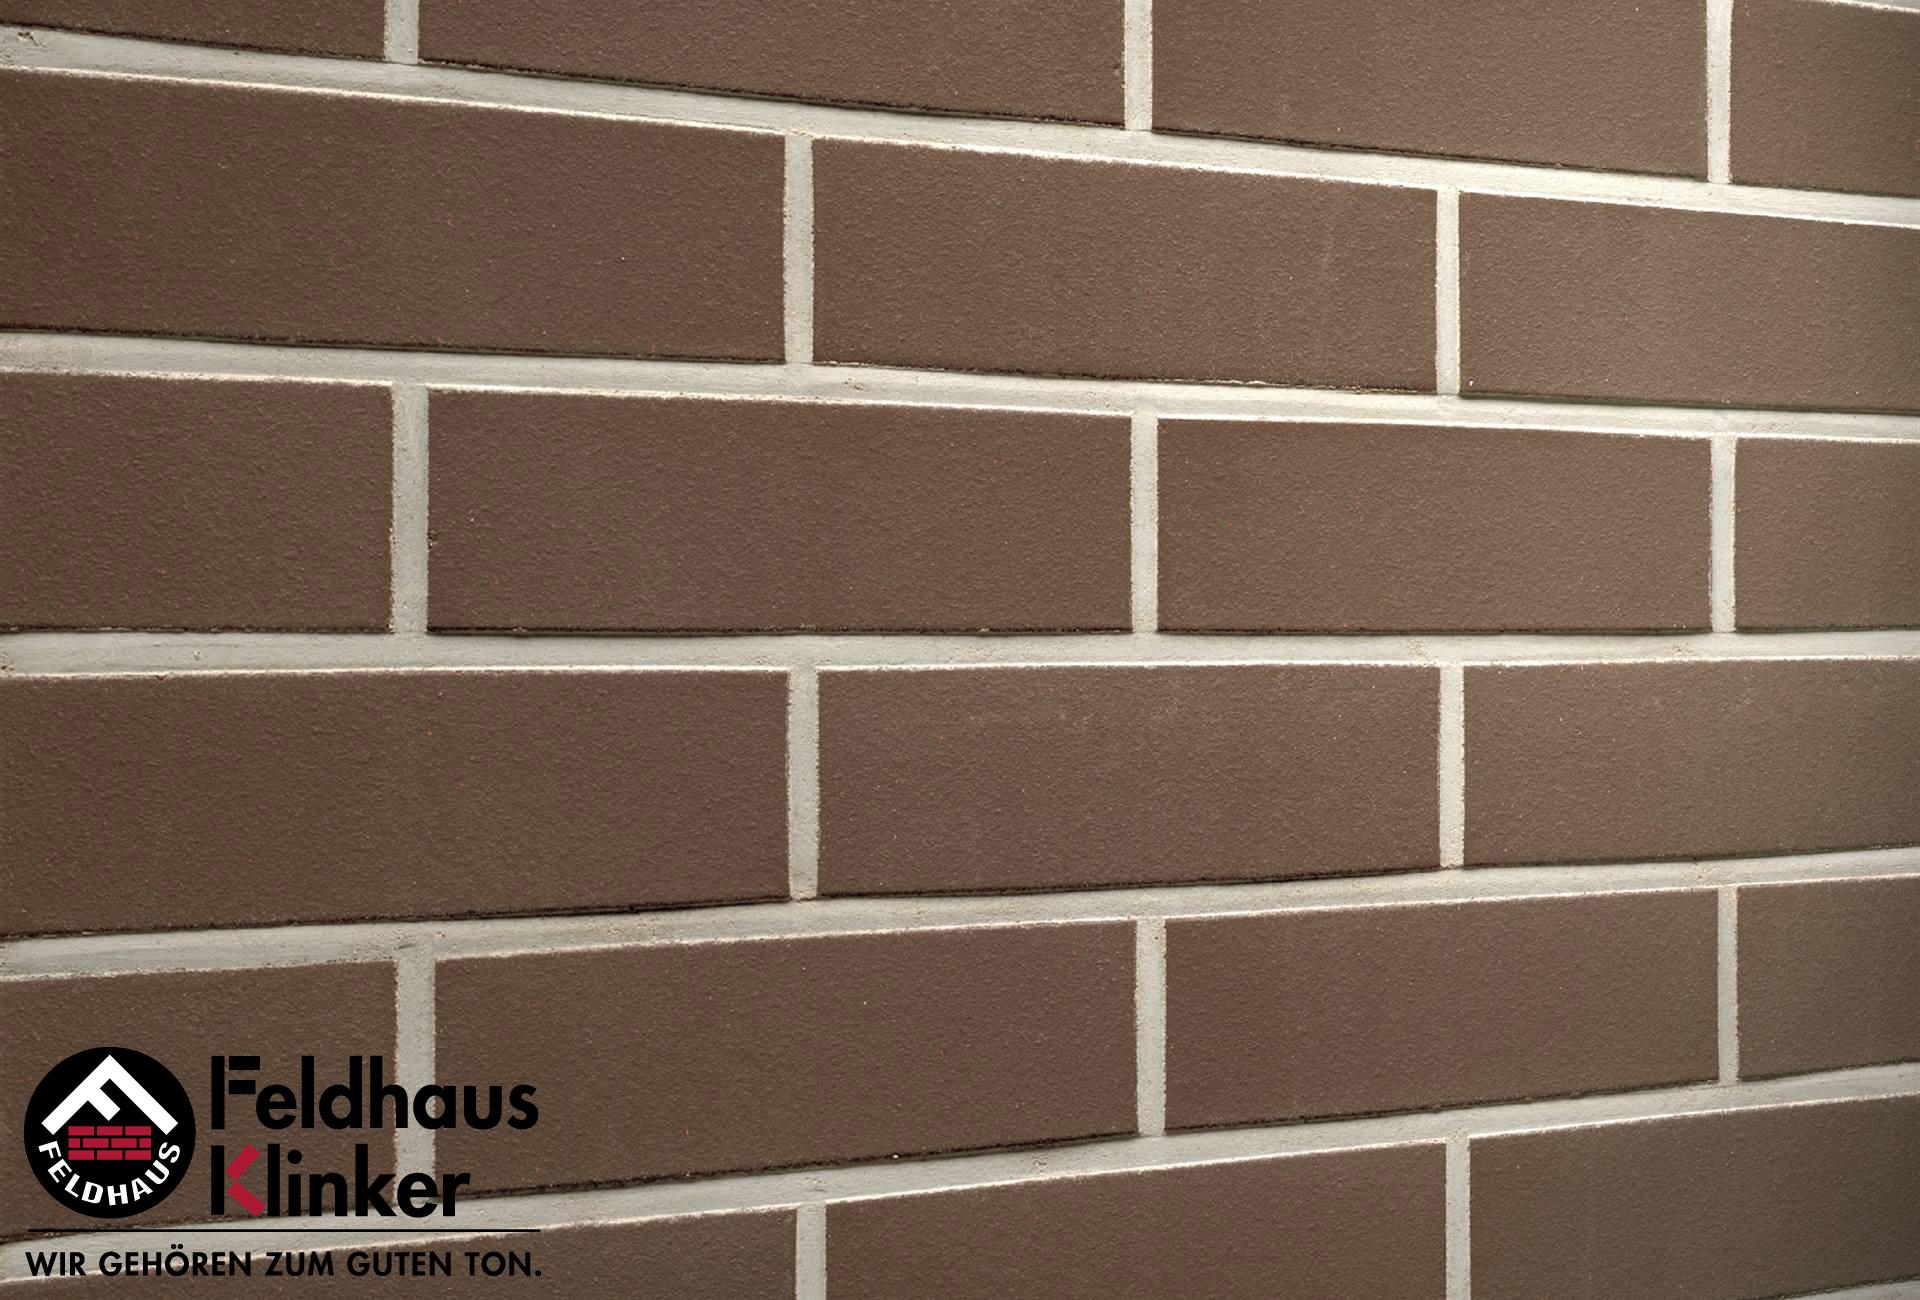 R500 Feldhaus Klinker клинкерная плитка 1